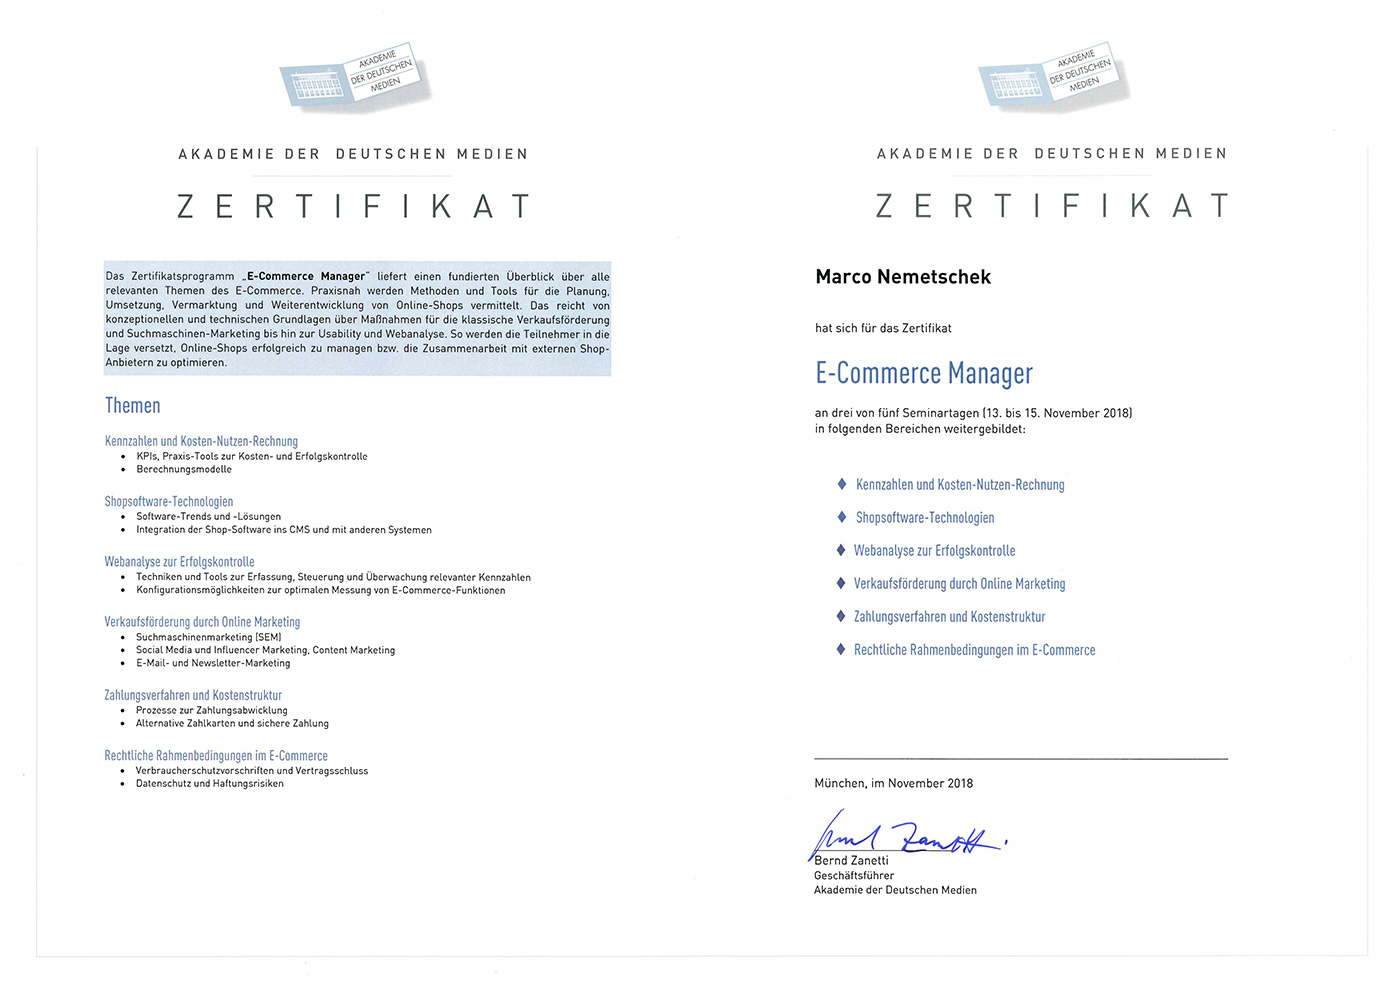 E-Commerce Manager - Marco Nemetschek